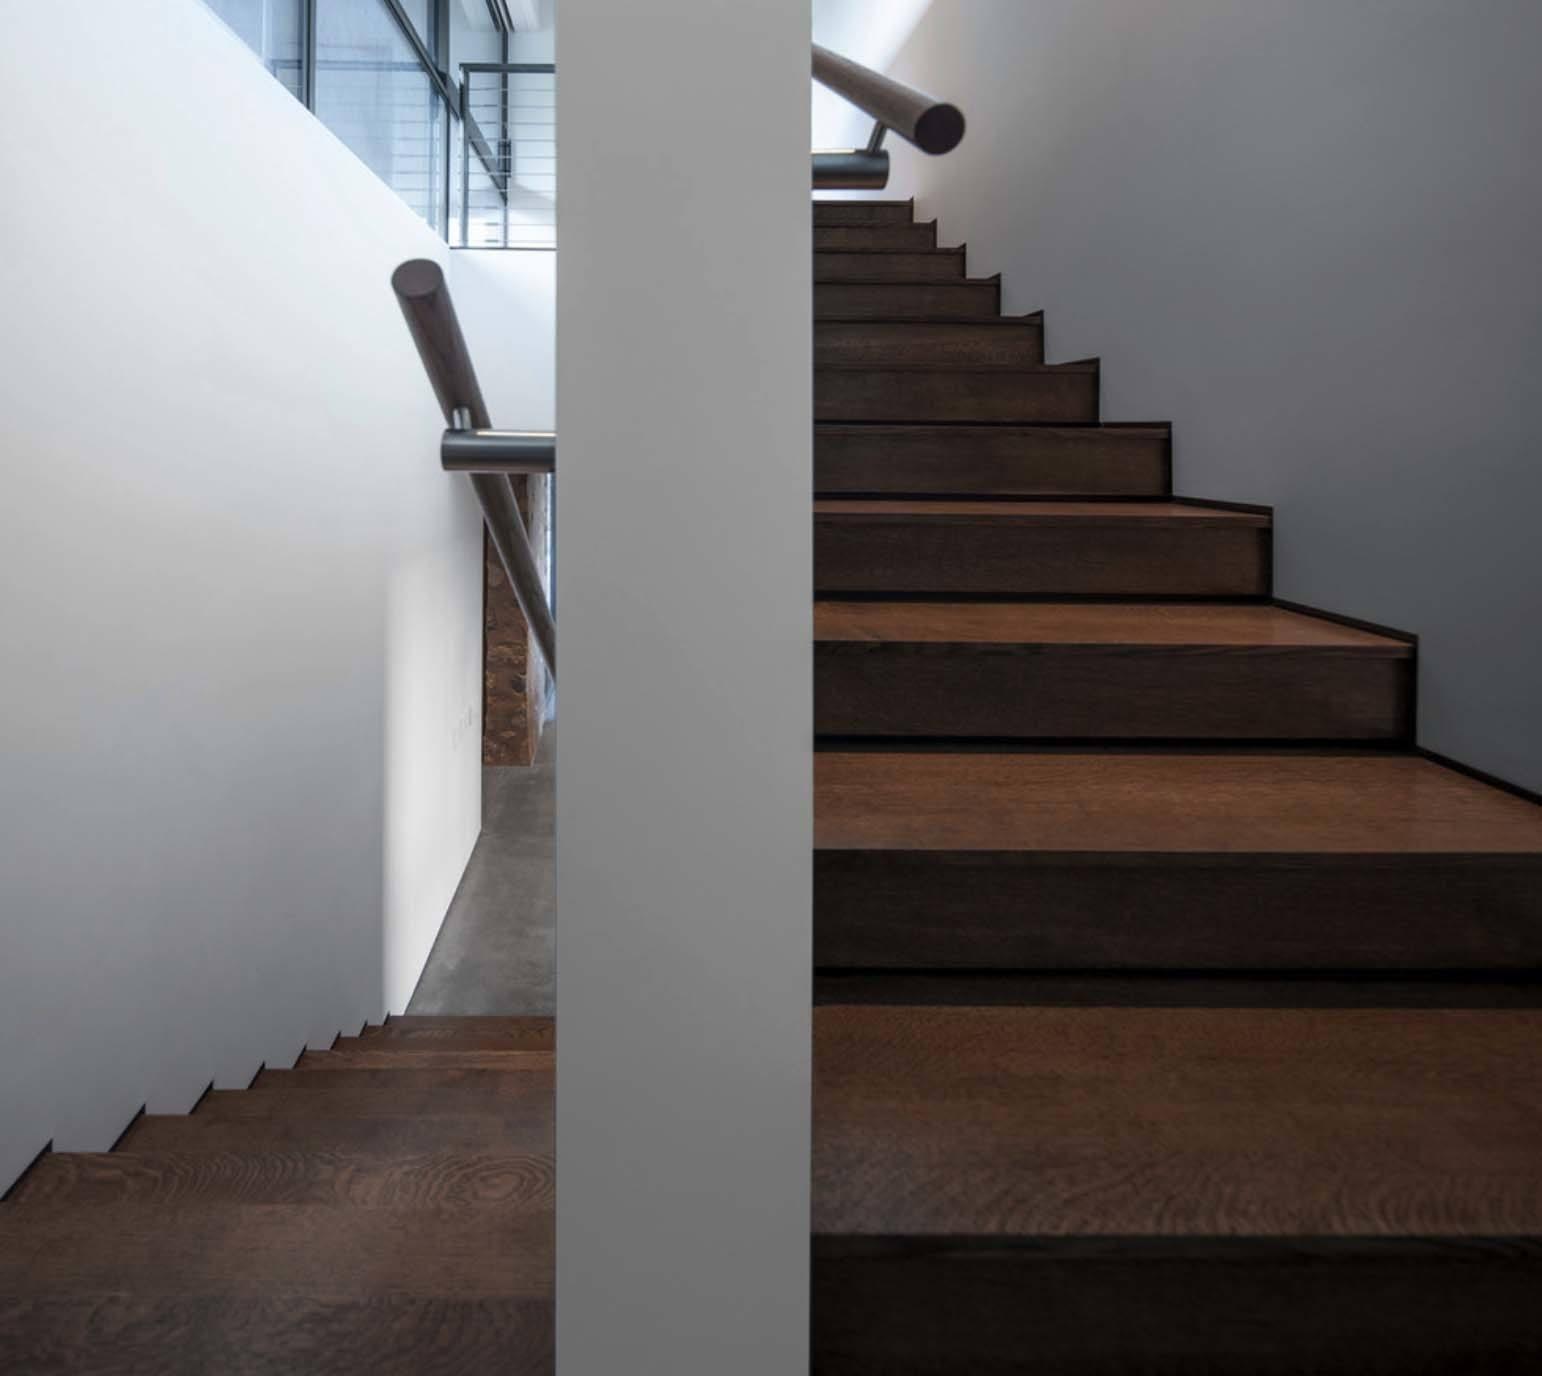 Modern-Residence-Architecture-Marmol-Radziner-10-1 Kindesign